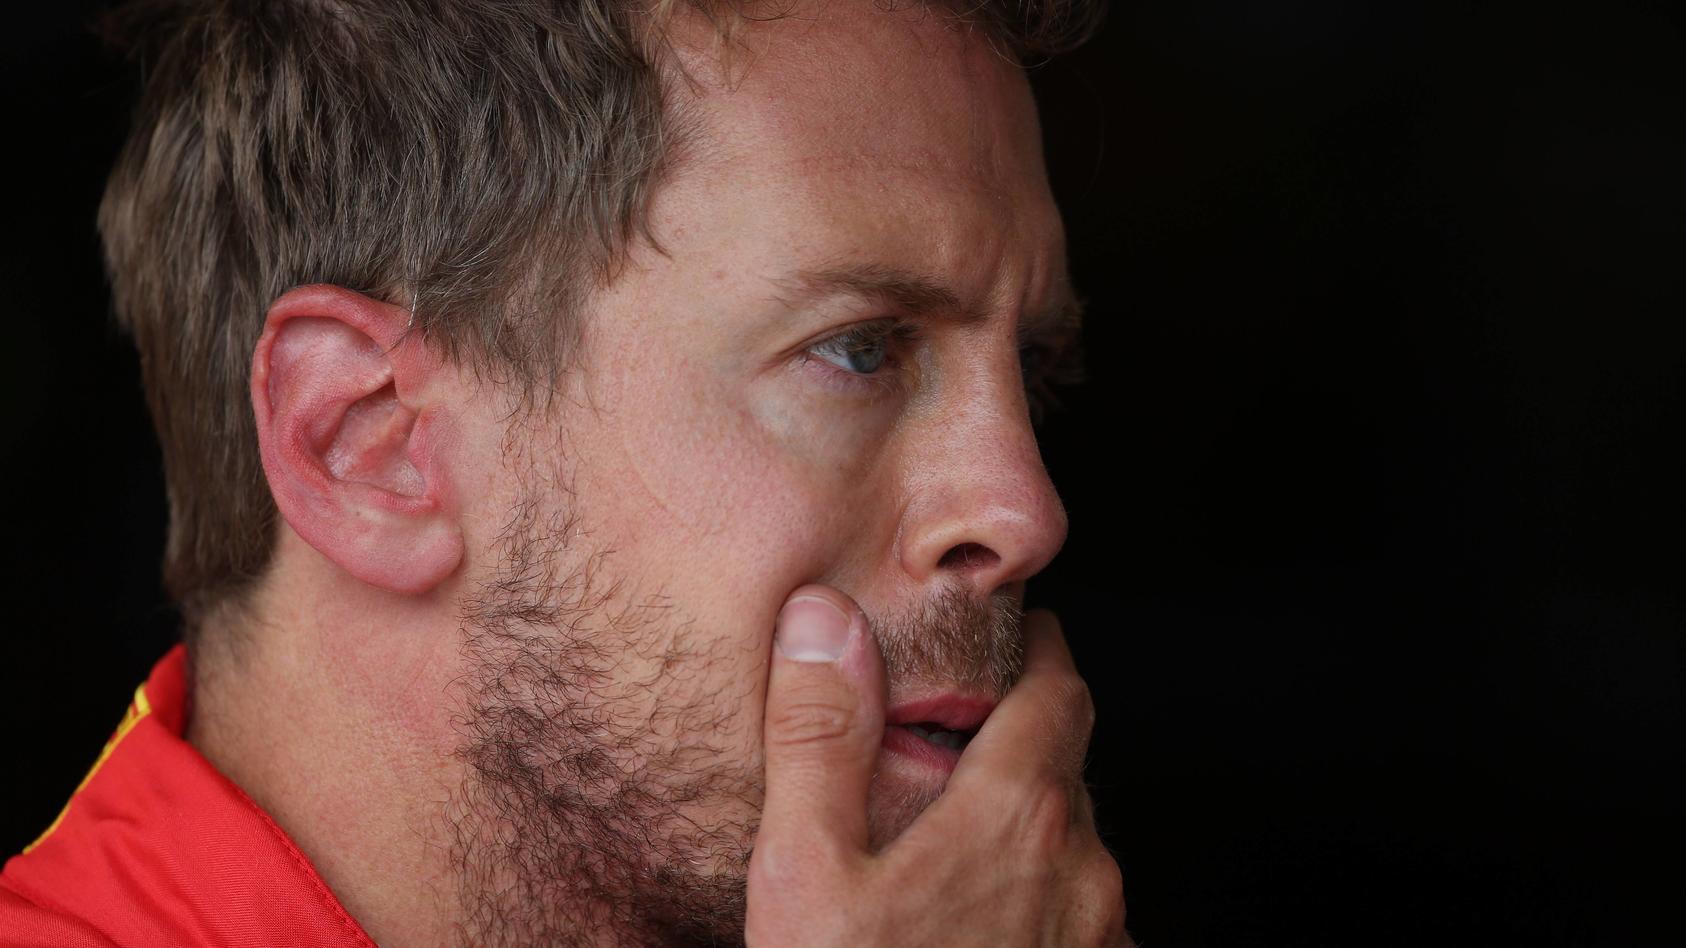 Sport Bilder des Tages Photo4 LaPresse 12 07 2019 Silverstone England Grand Prix Formula One Engl